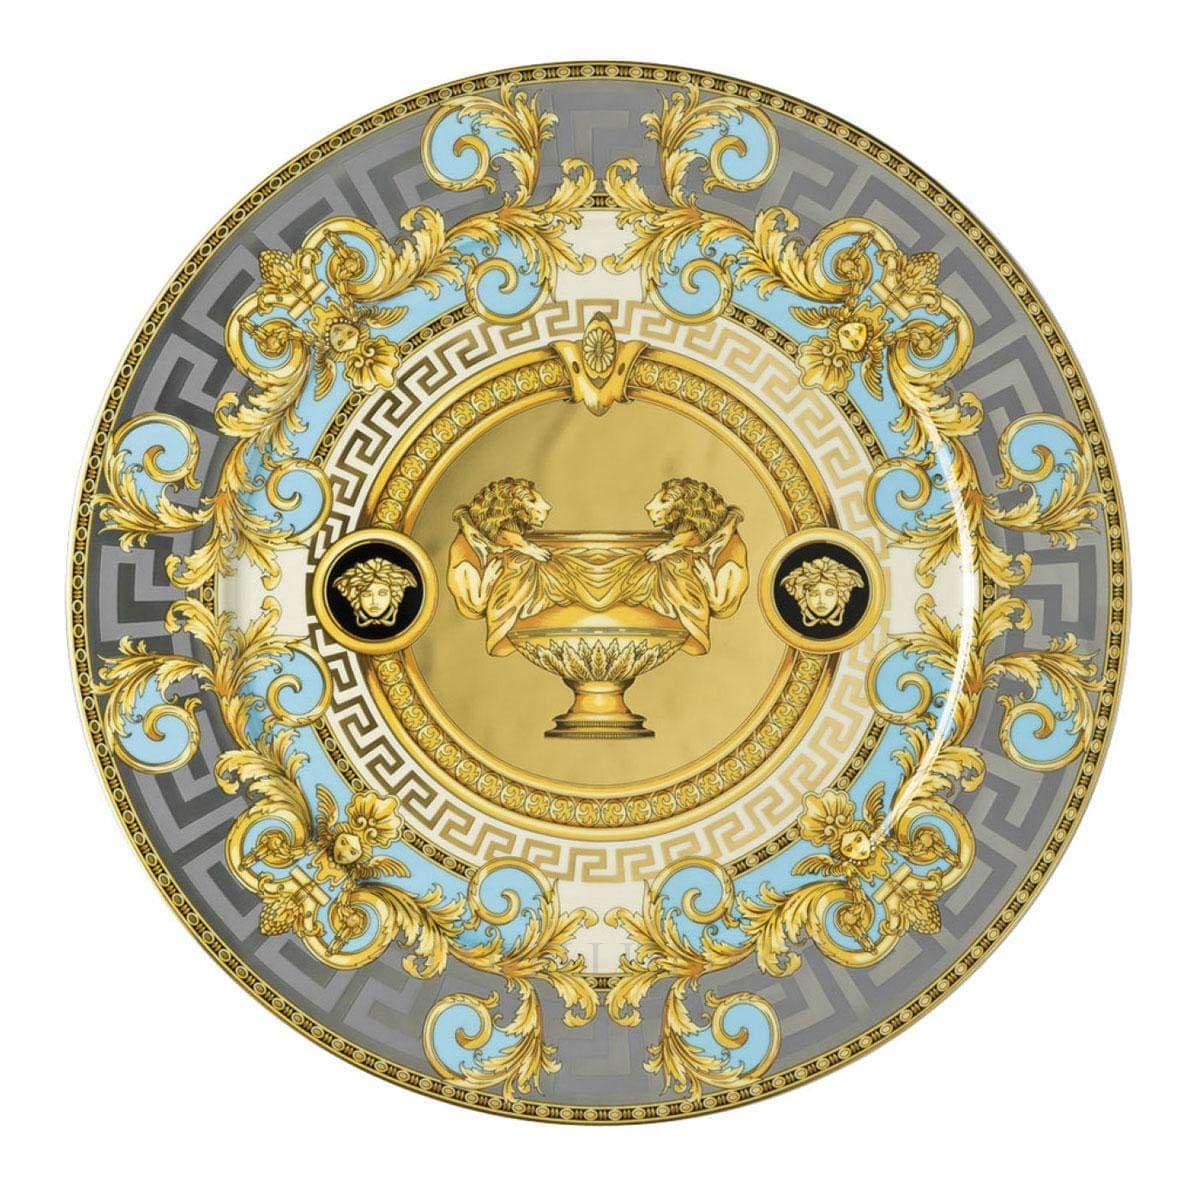 Versace Prestige Gala Le Bleu Service Plate 30 cm by Rosenthal